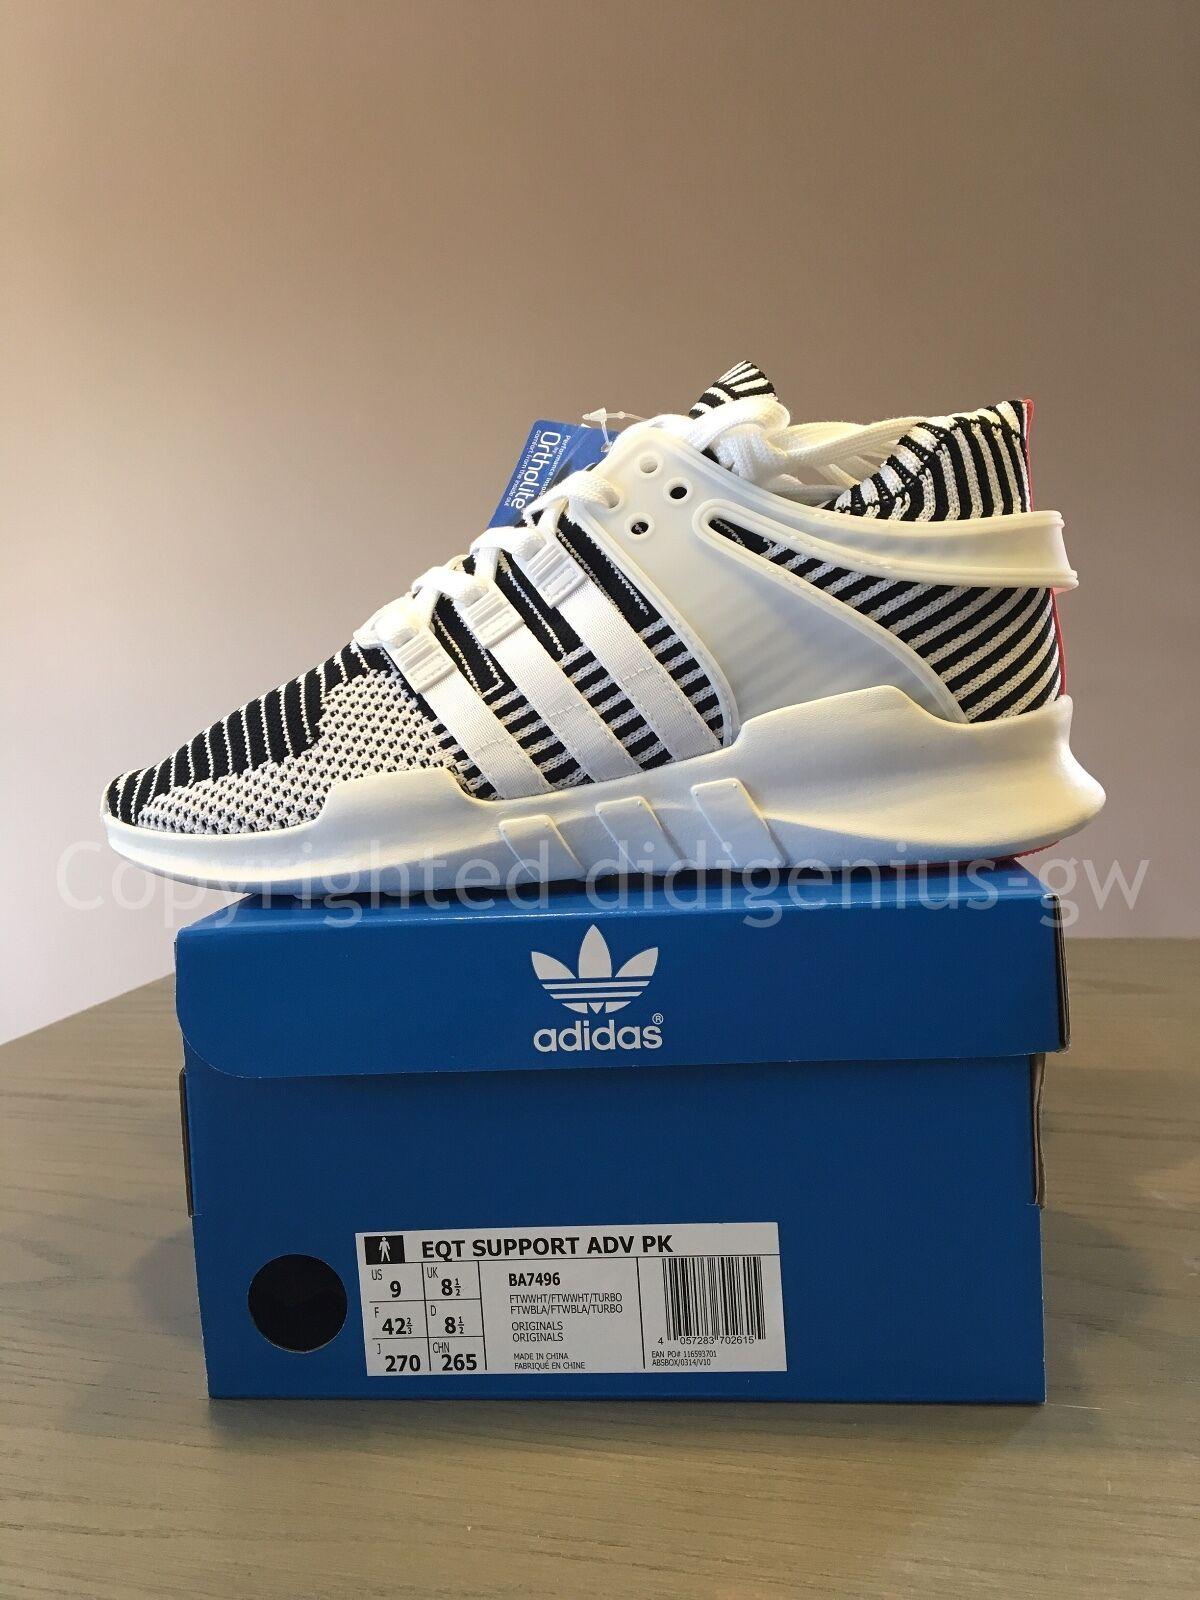 Adidas EQT Support ADV Primeknit  Zebra  EU 42 2 3 US 9 UK 8 1 2 Boost NMD PK